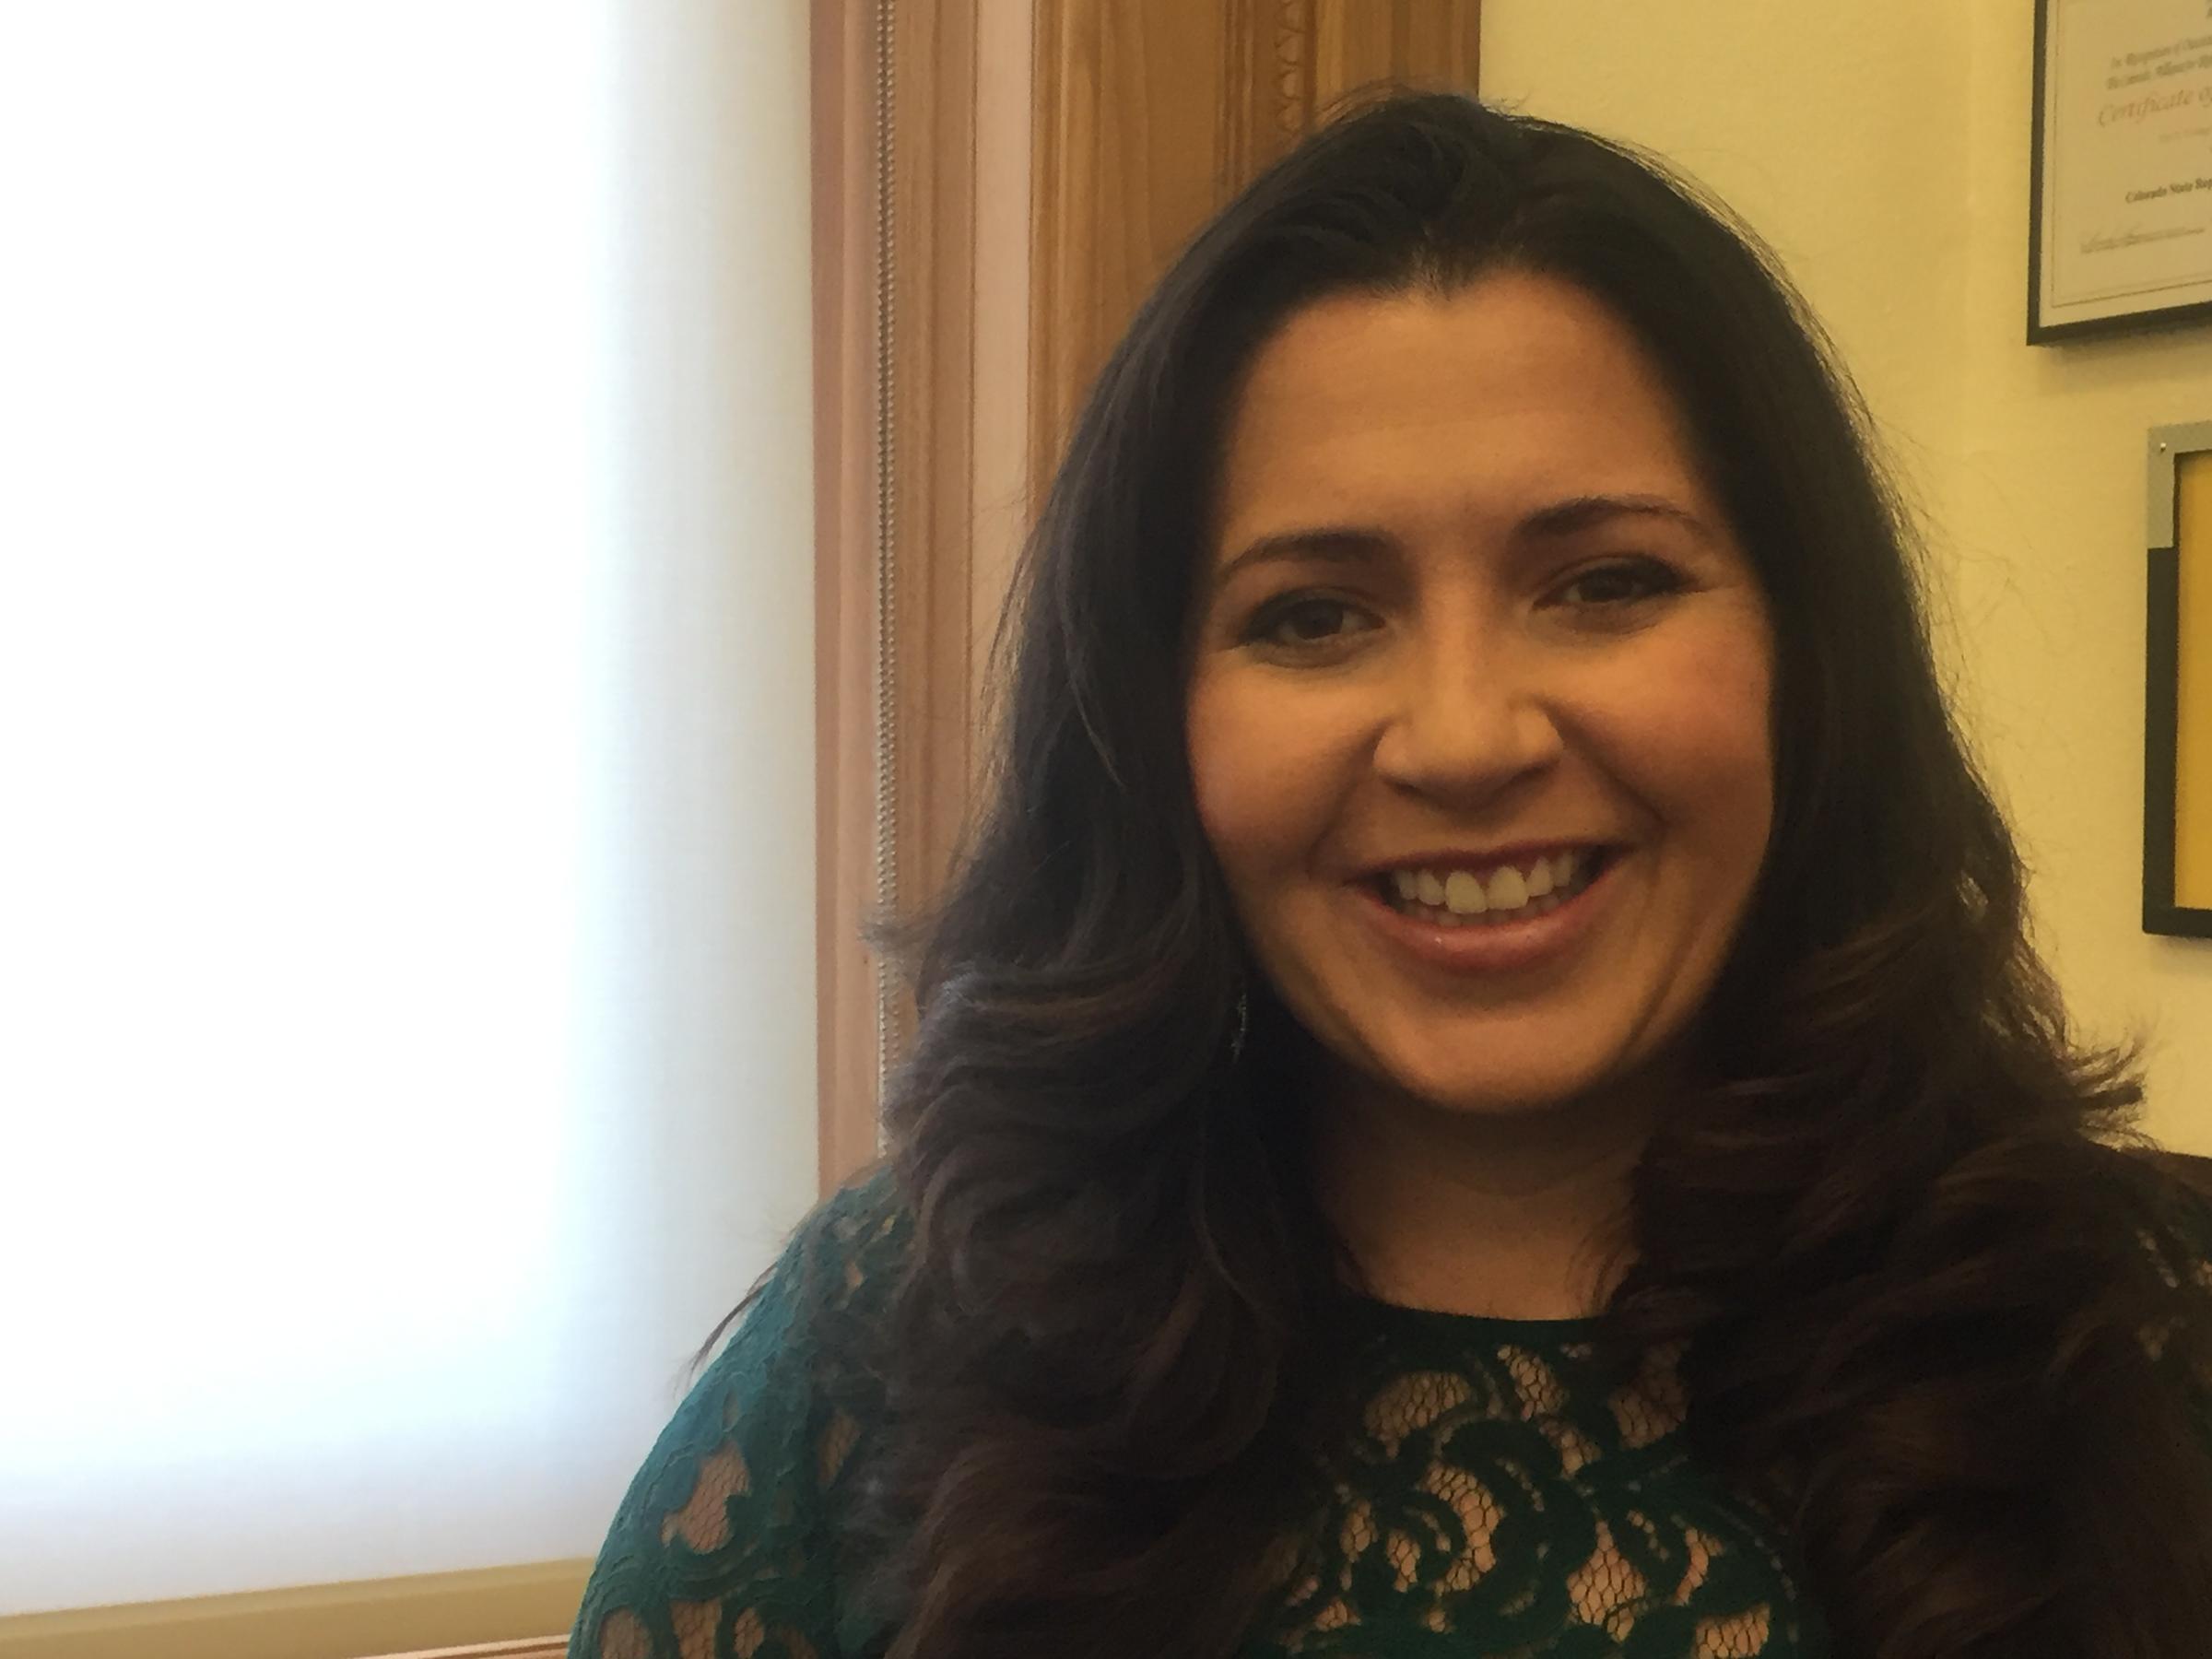 Speaker of the House Crisanta Duran